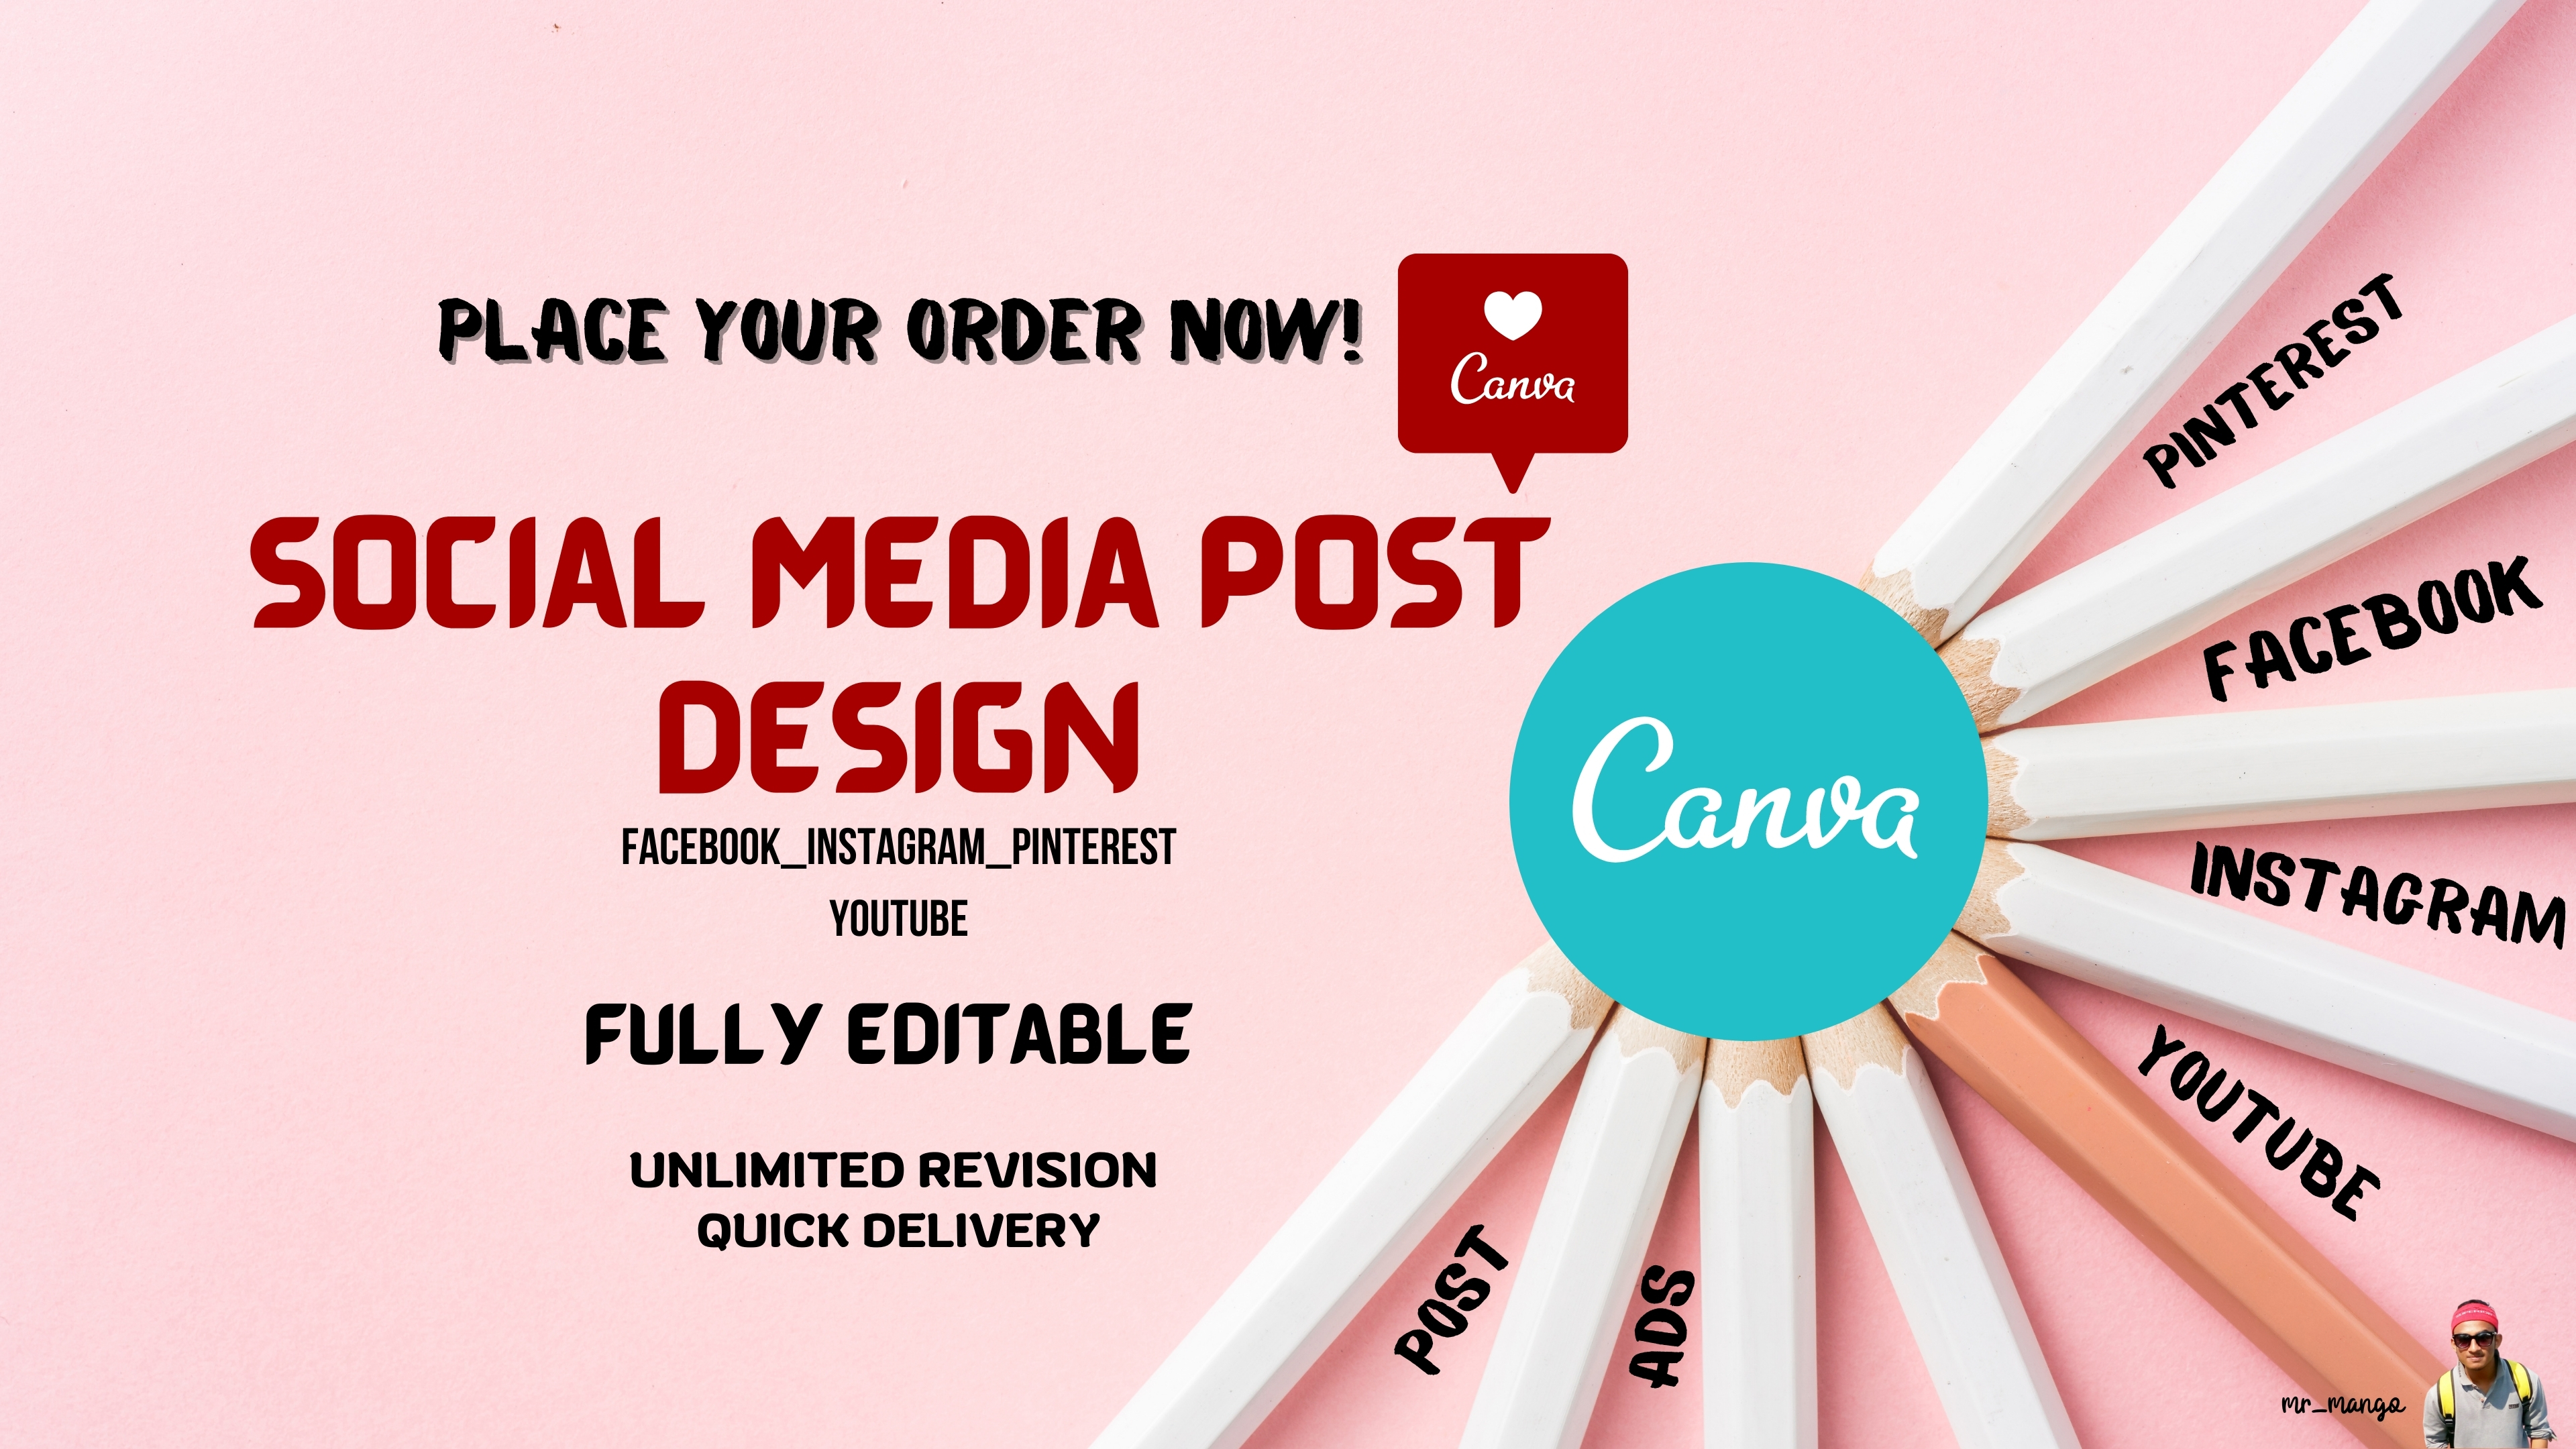 I will design social media post & editable canva pro templates